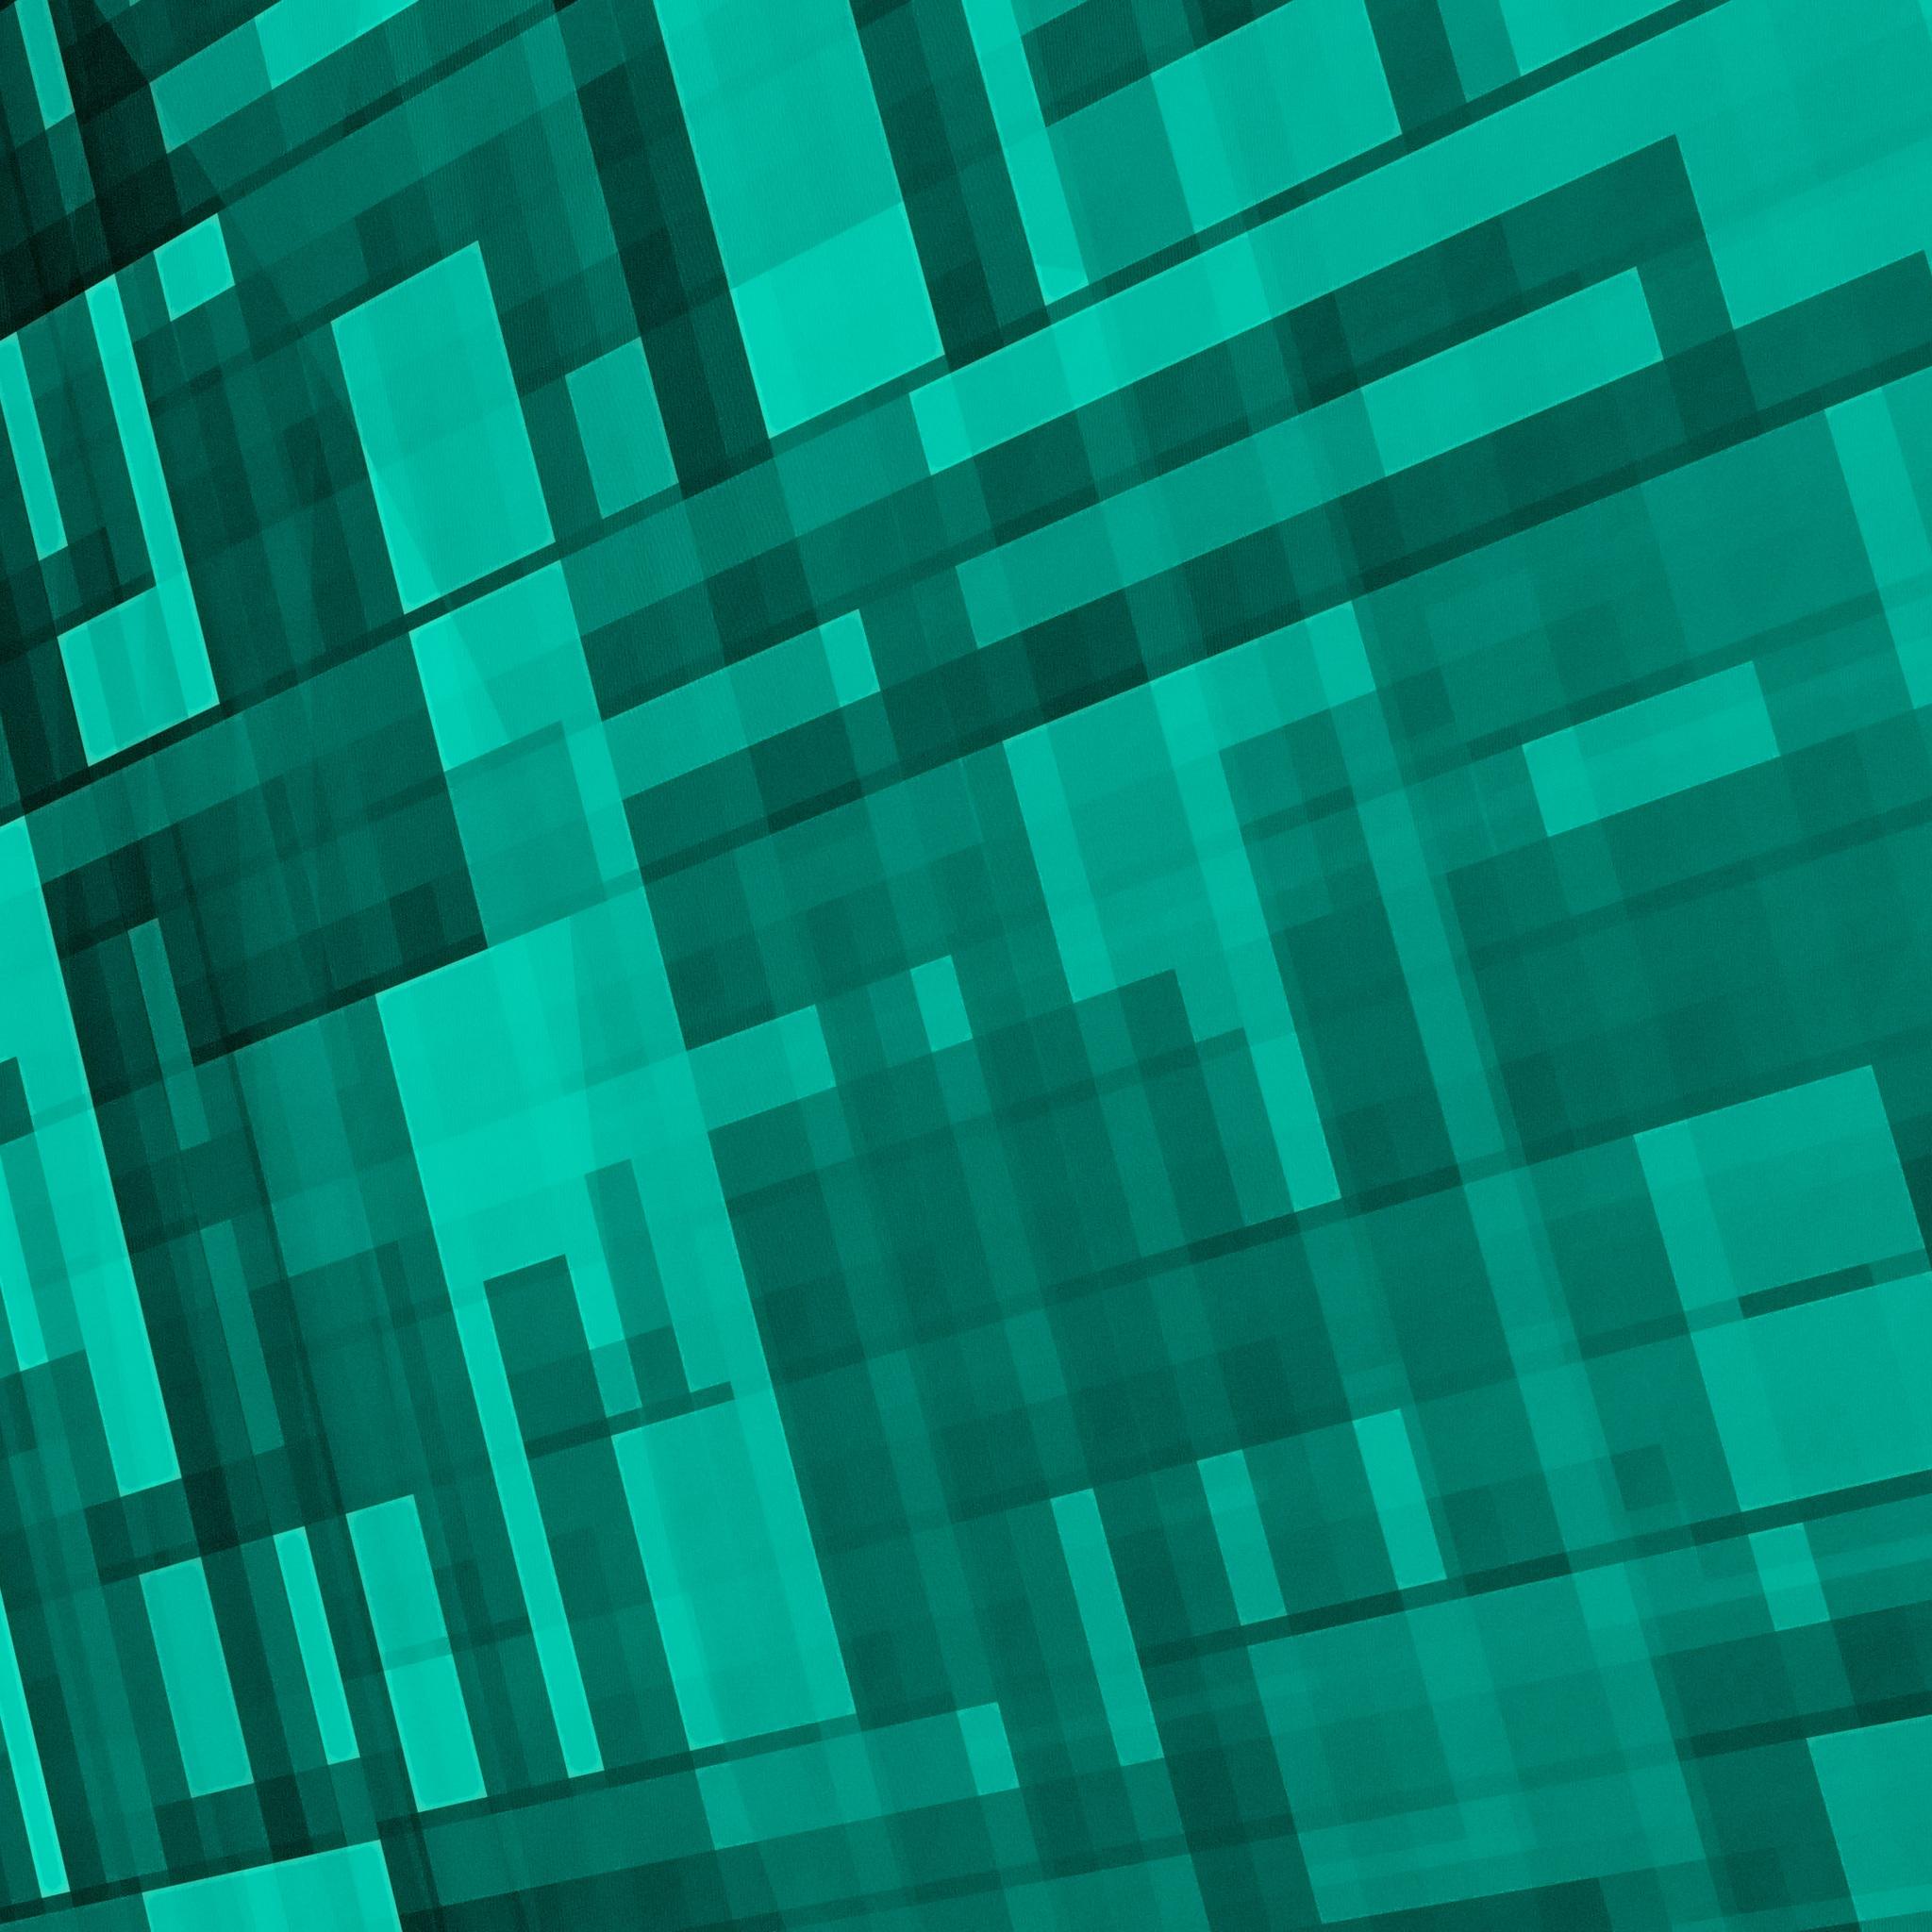 2048x2048 Neon Green Abstract 4k Ipad Air Hd 4k Wallpapers